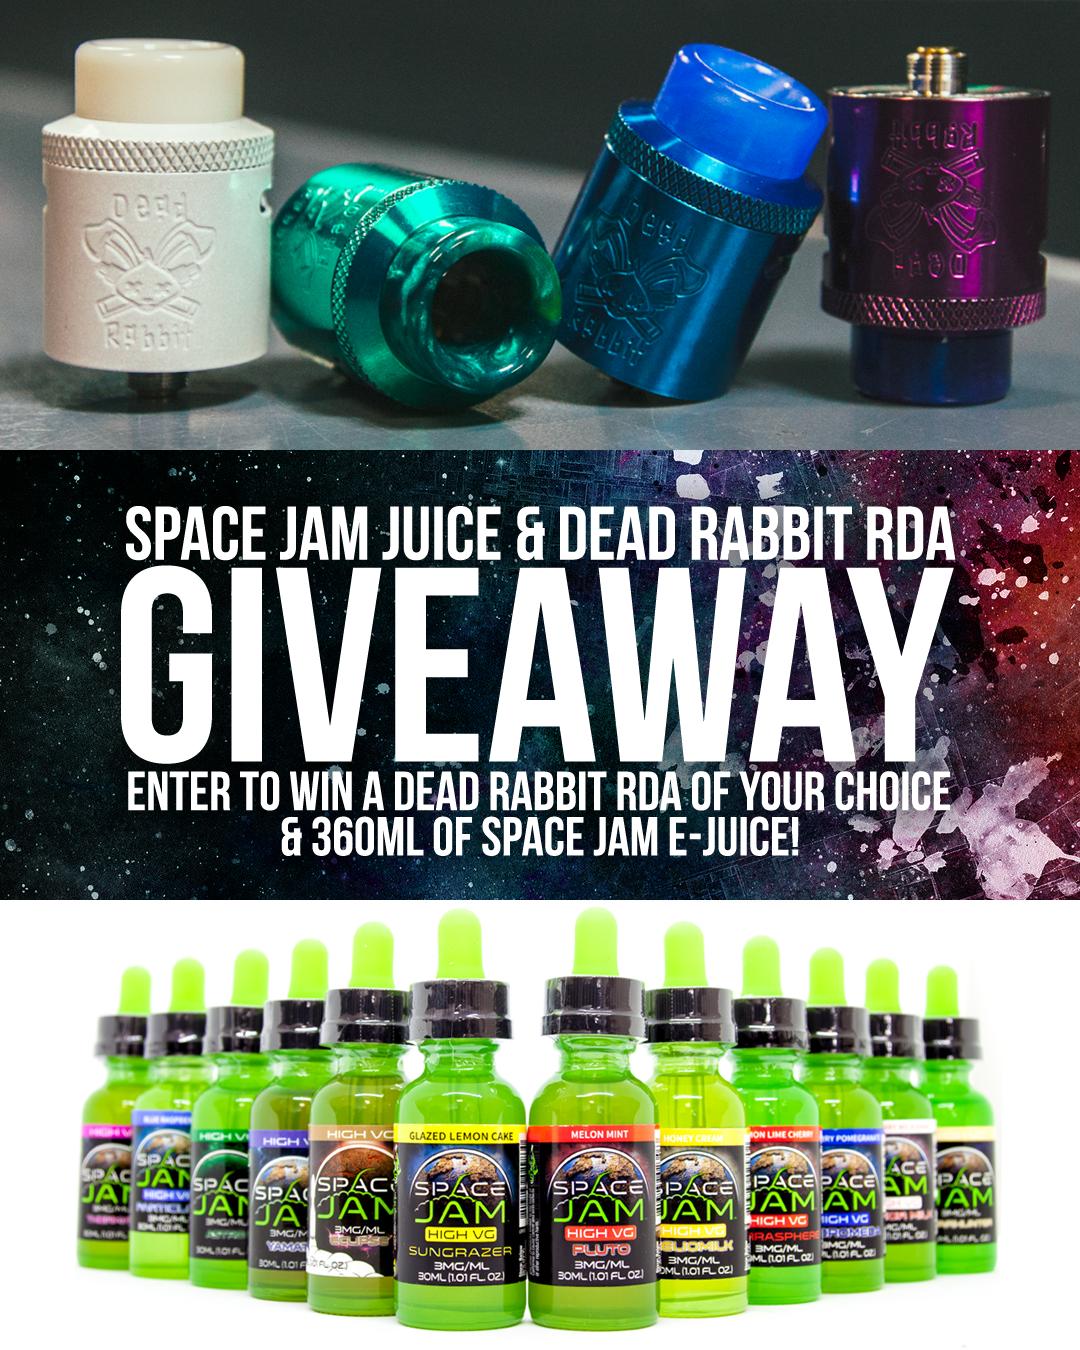 Space Jam Juice & Dead Rabbit RDA Giveaway! - EVcigarettes com